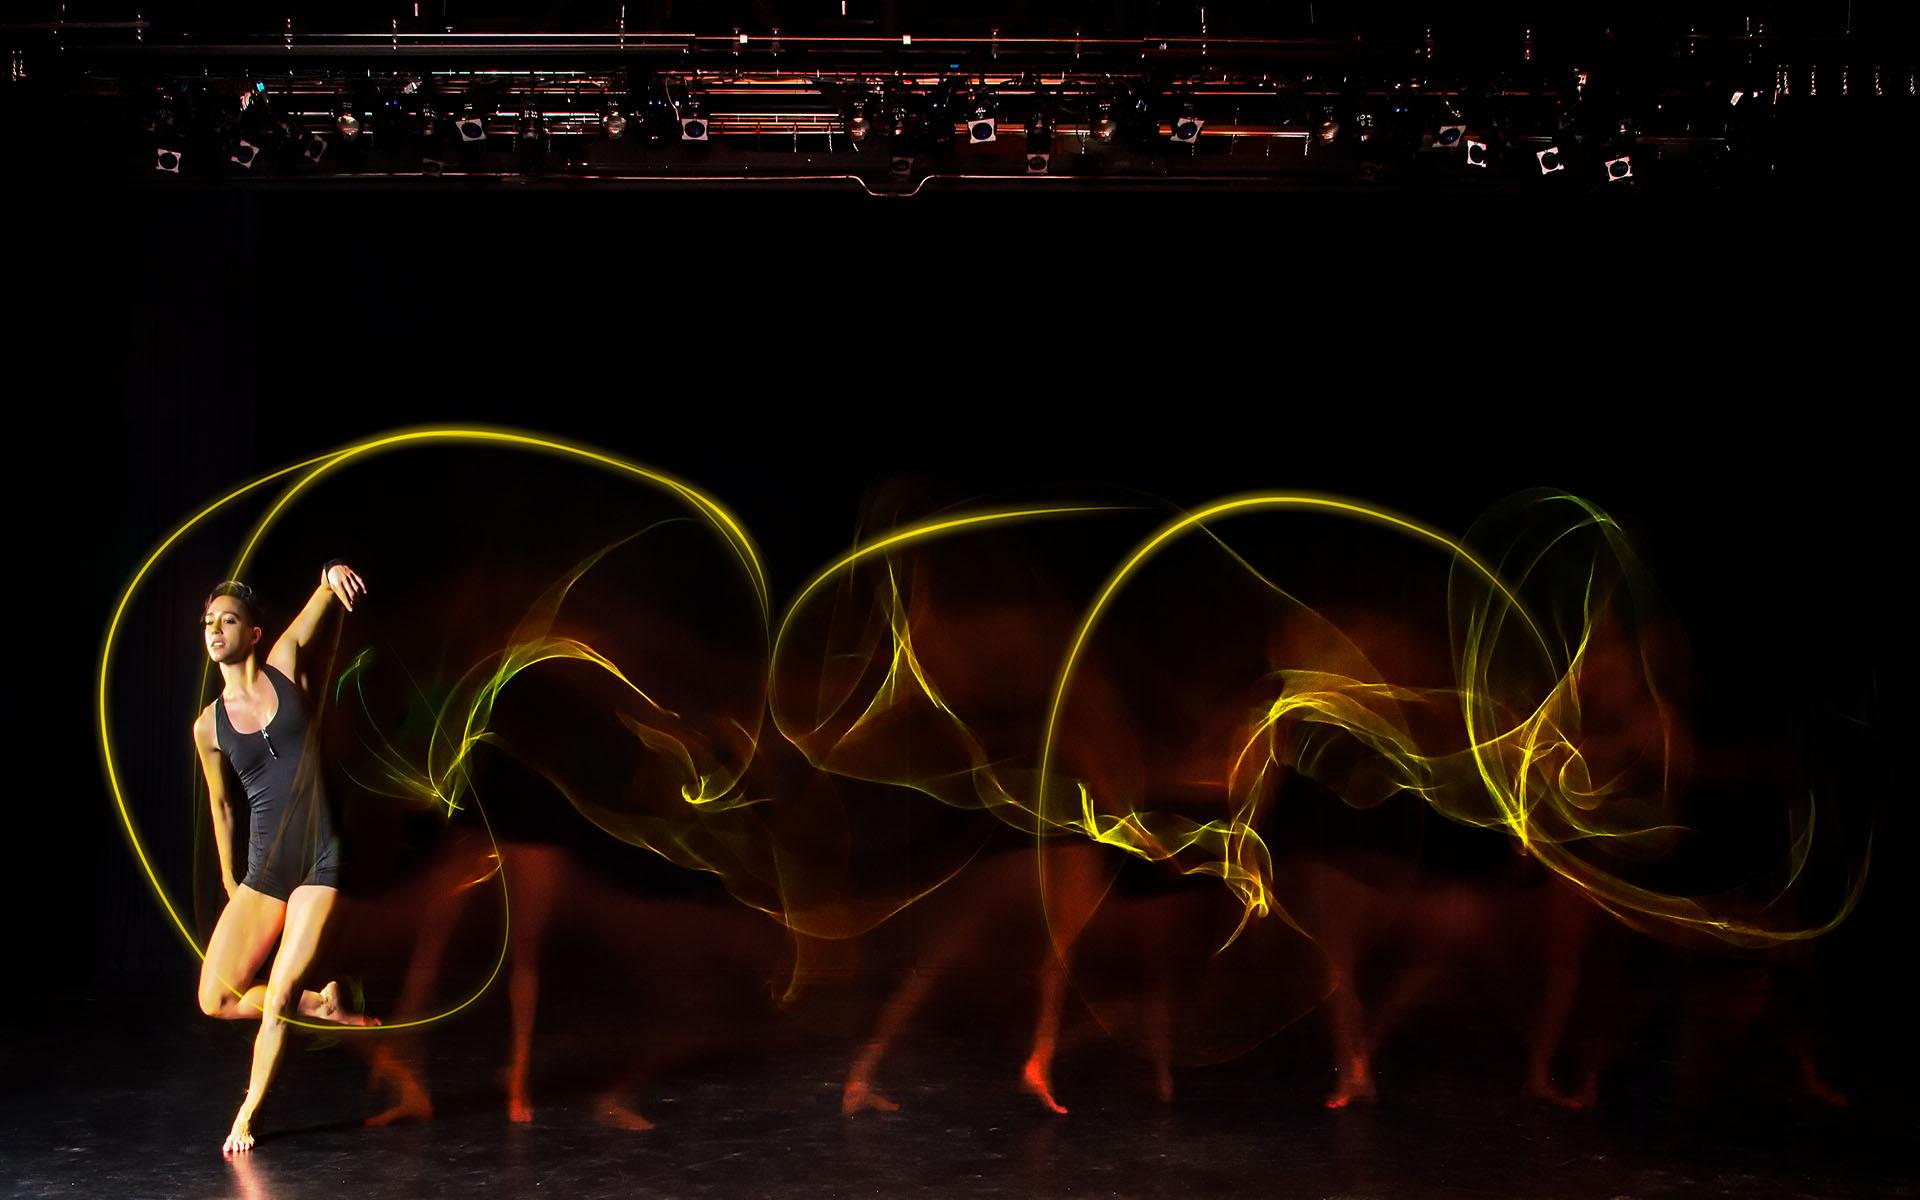 Light Painting Dance